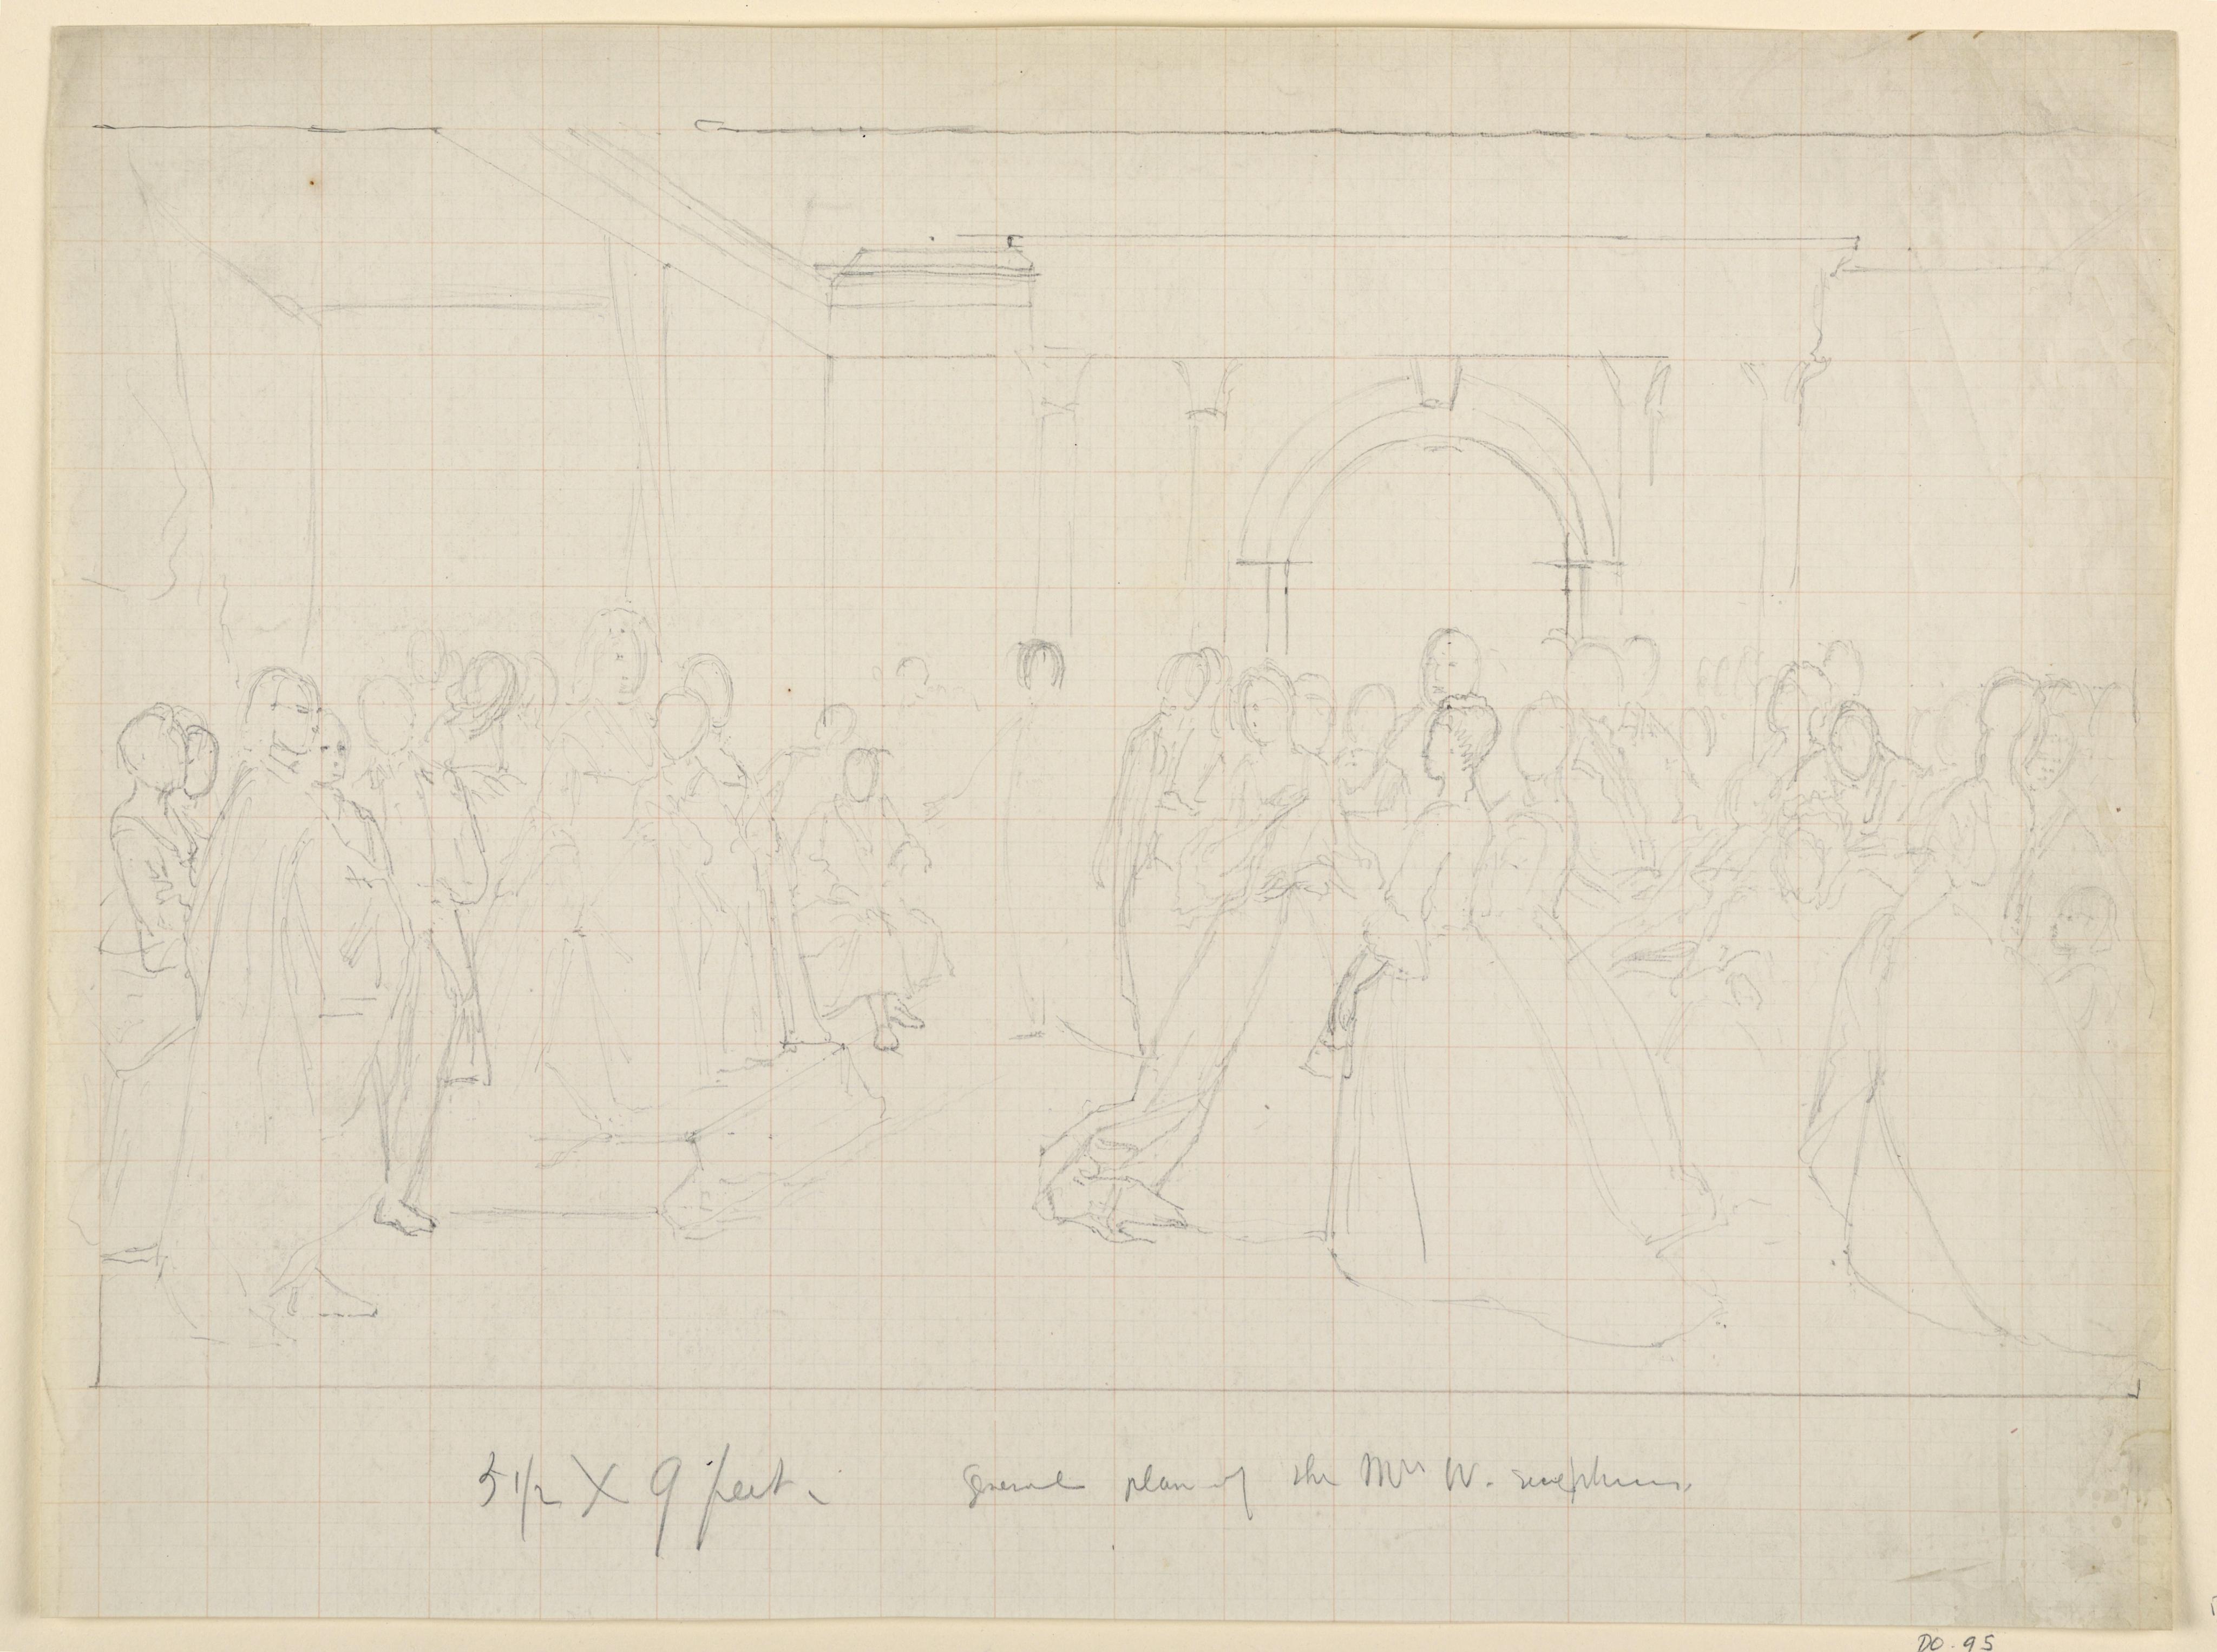 4096x3053 Filedrawing, General Plan For Martha Washington Reception, 1860